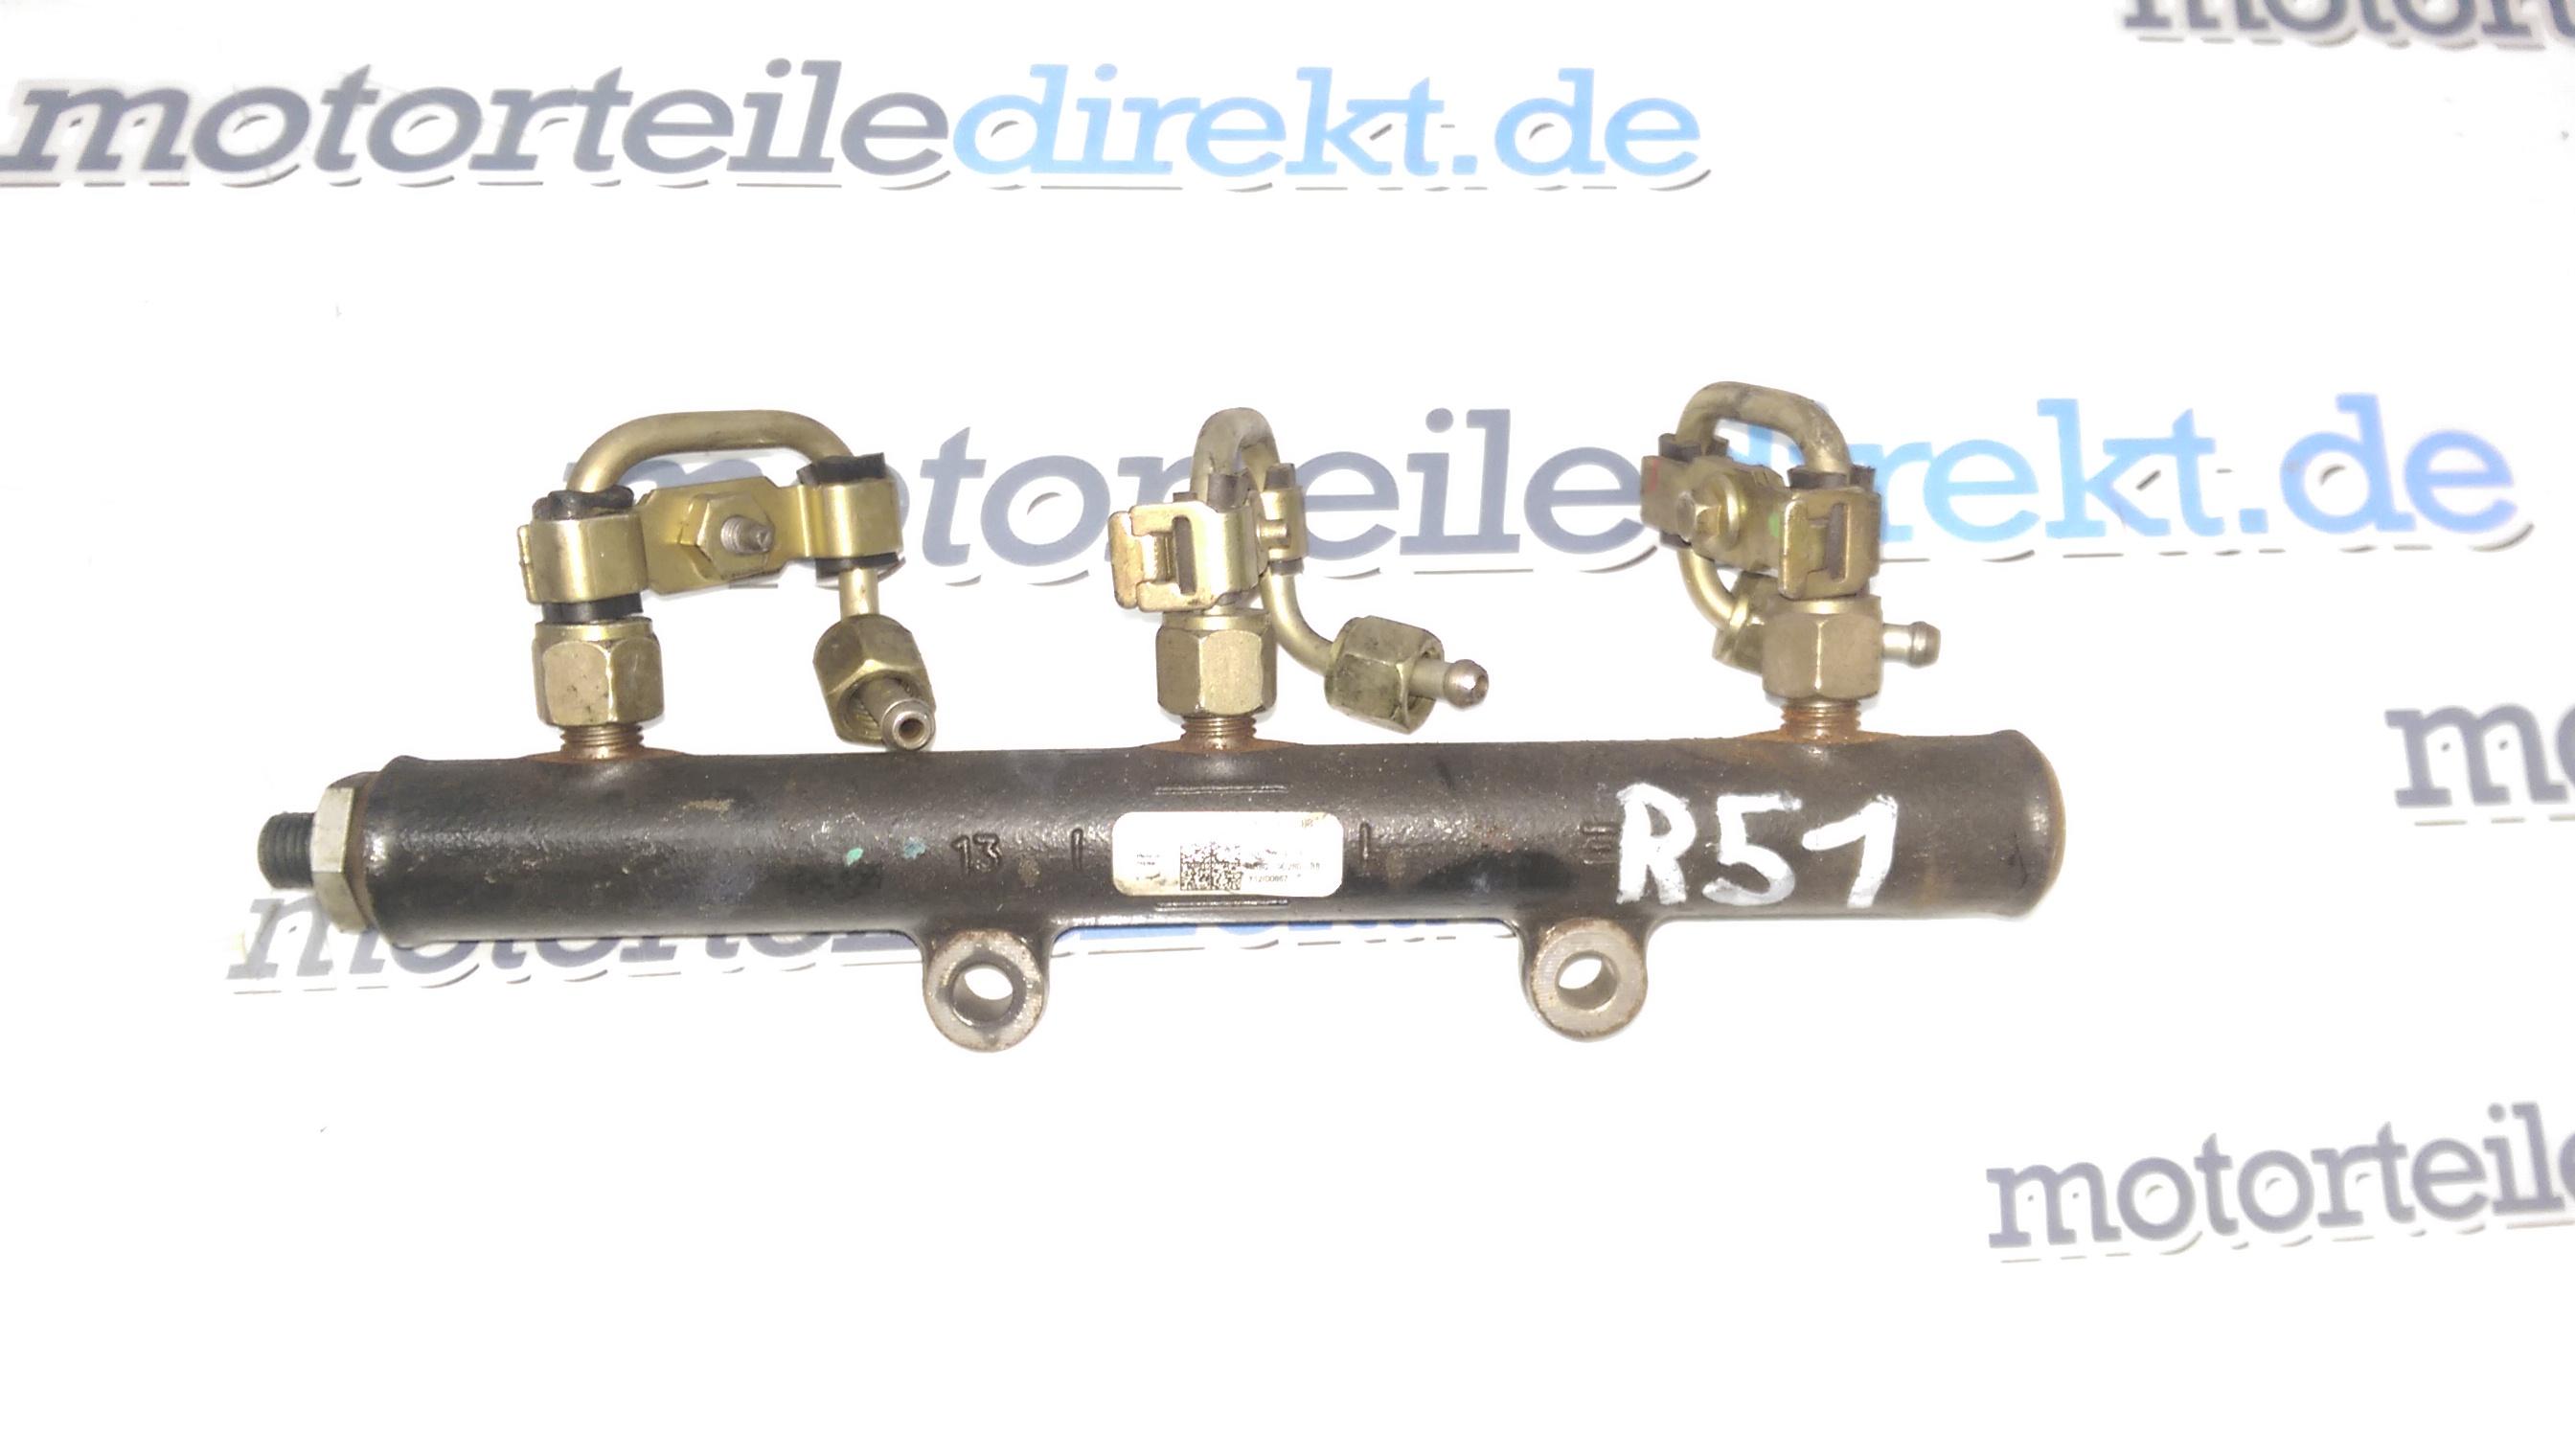 Tubo rail Kraftstoffverteiler land Discovery IV 2,7 276DT 4R8Q-9D280-BB IT31740